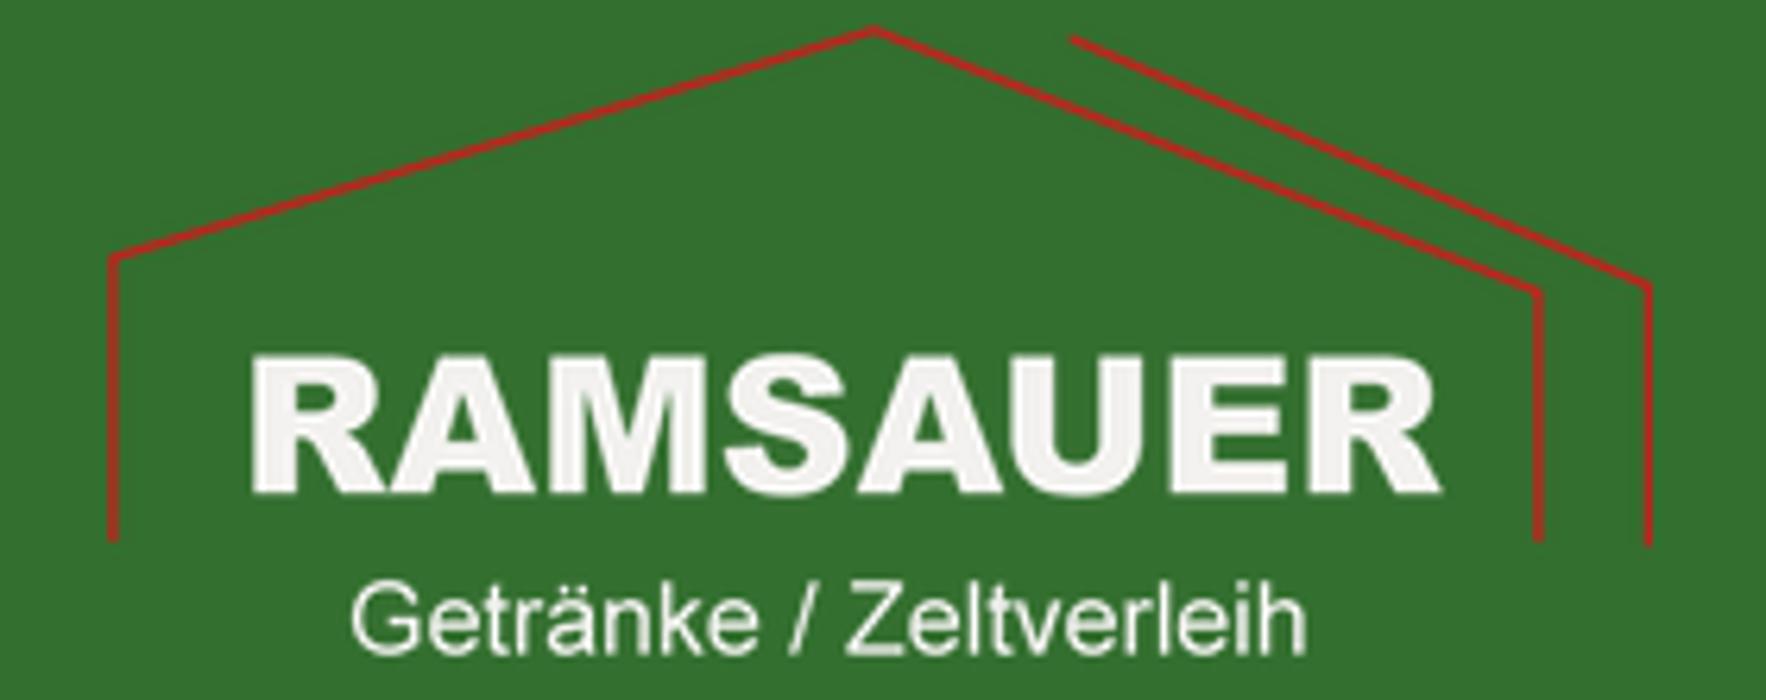 Getraenke Abholmaerkte Einzelhandel Neuhaus (94152) - YellowMap